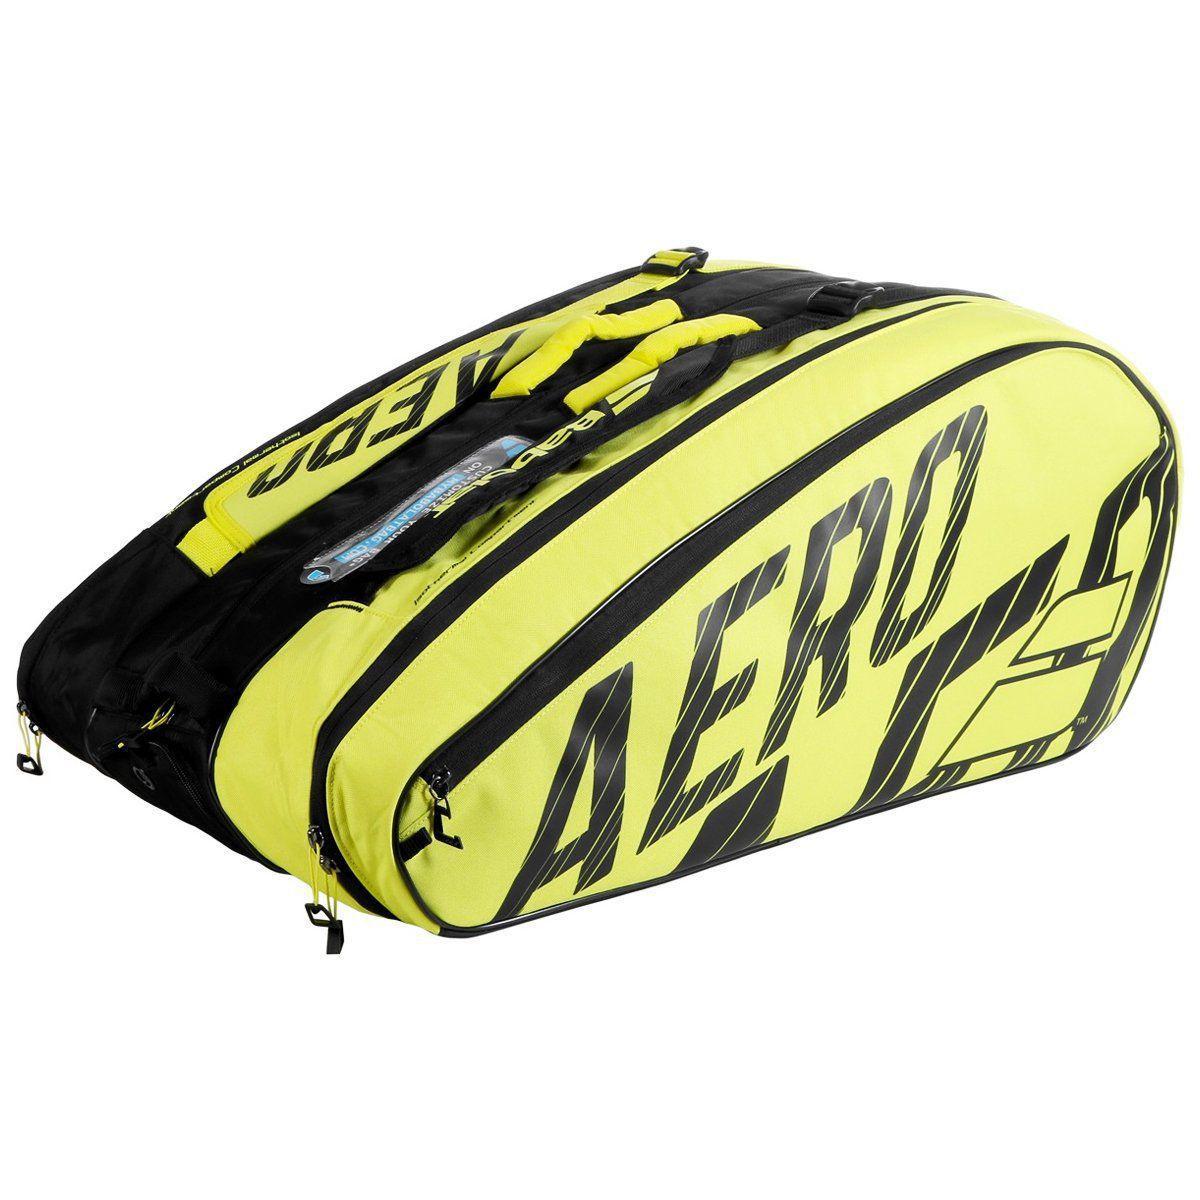 Raqueteira Babolat Pure Aero R12 Térmica - 2021  - PROTENISTA